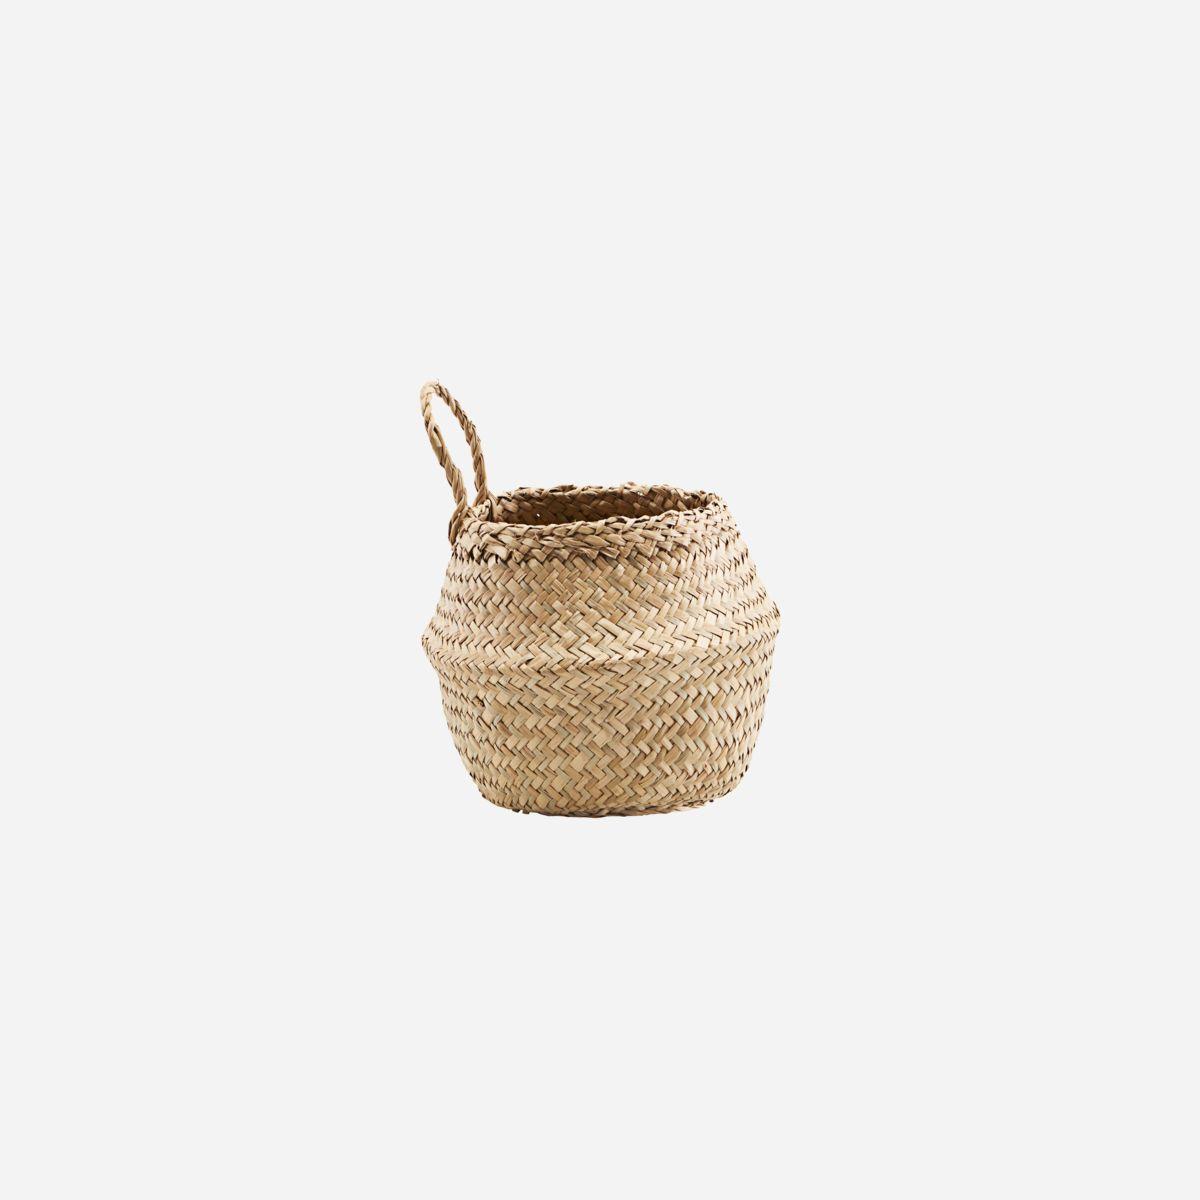 Tanger Basket, Small